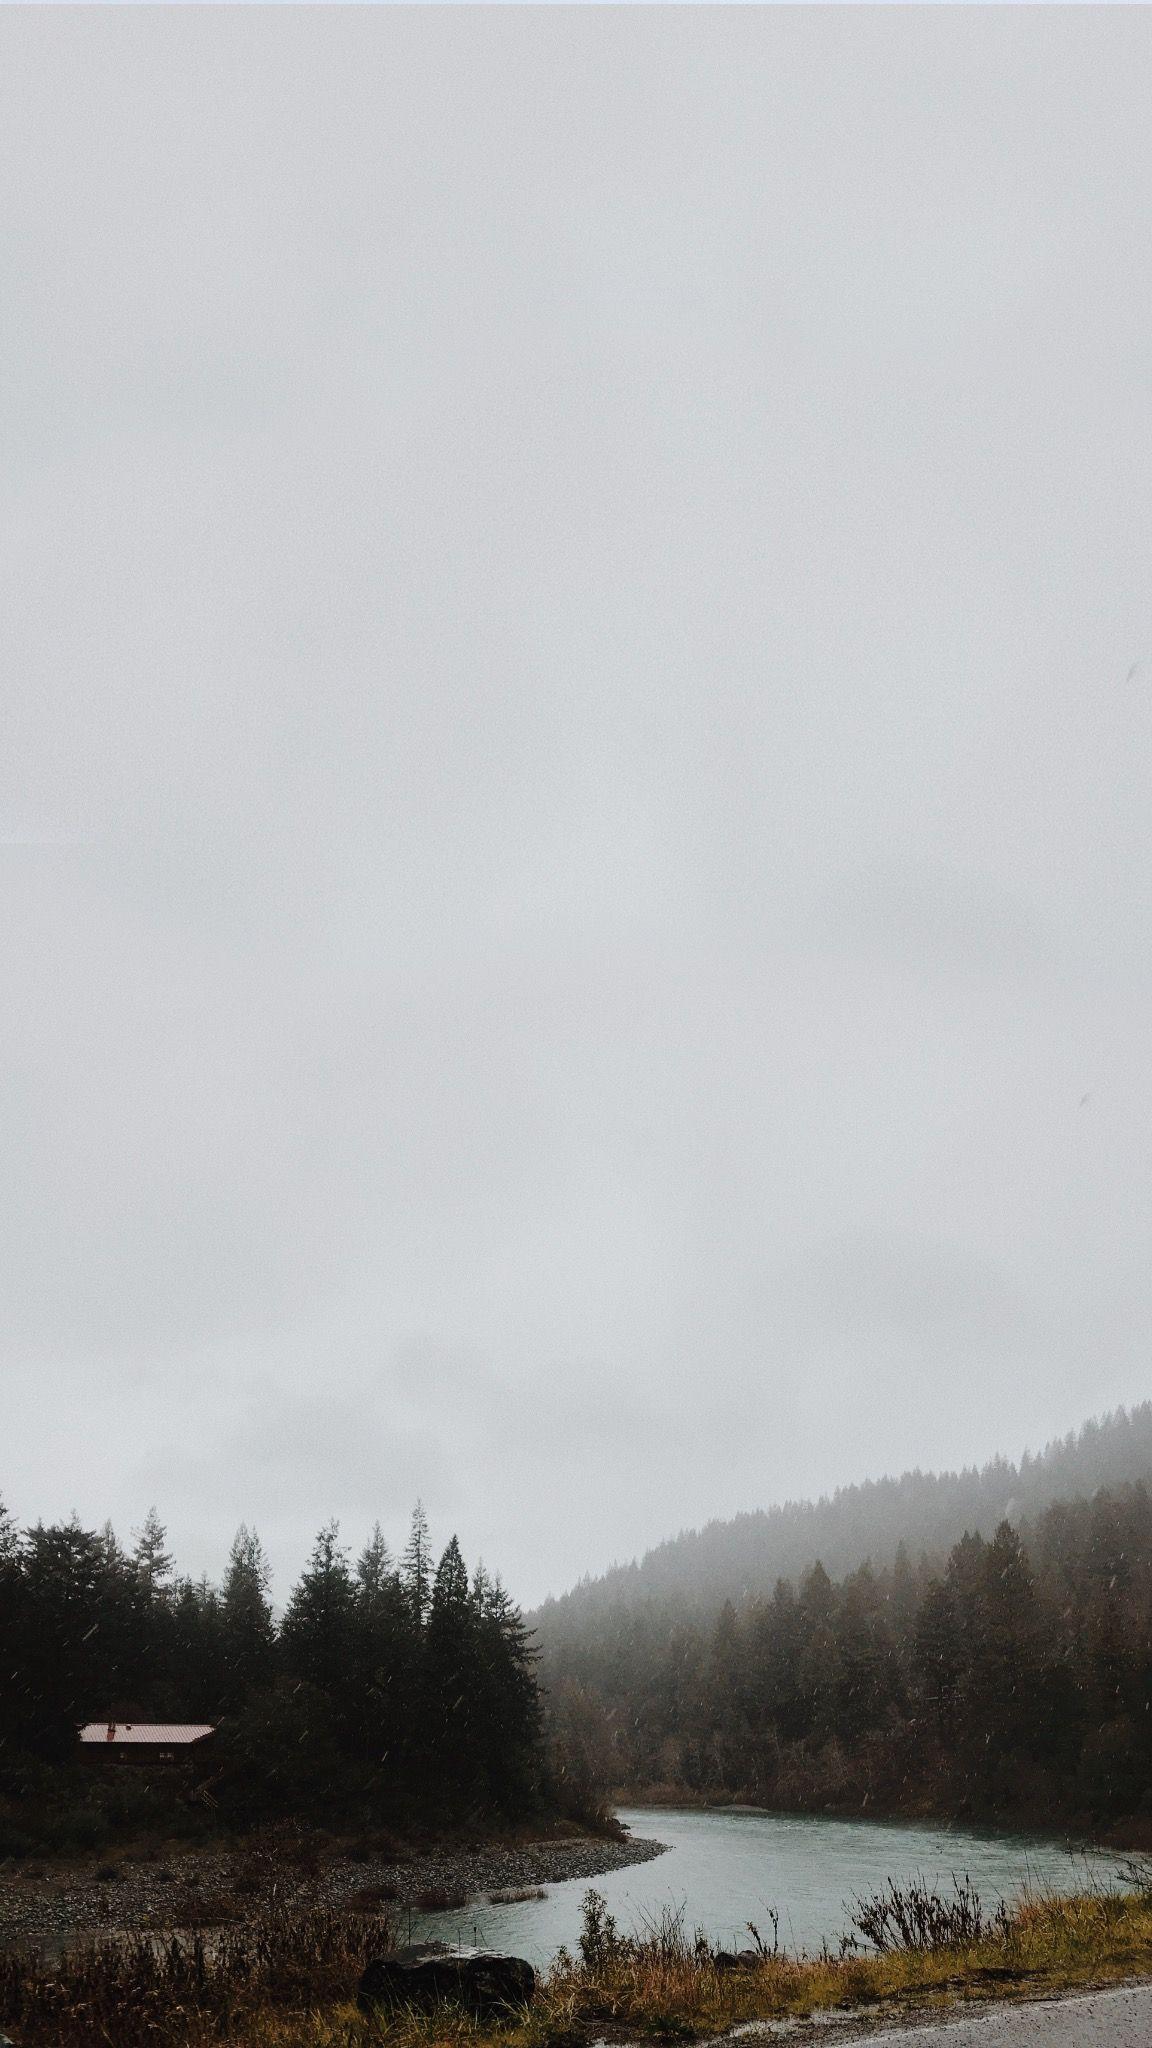 Rustic Mountain Cabin Lock Screen Home Screen Wallpaper